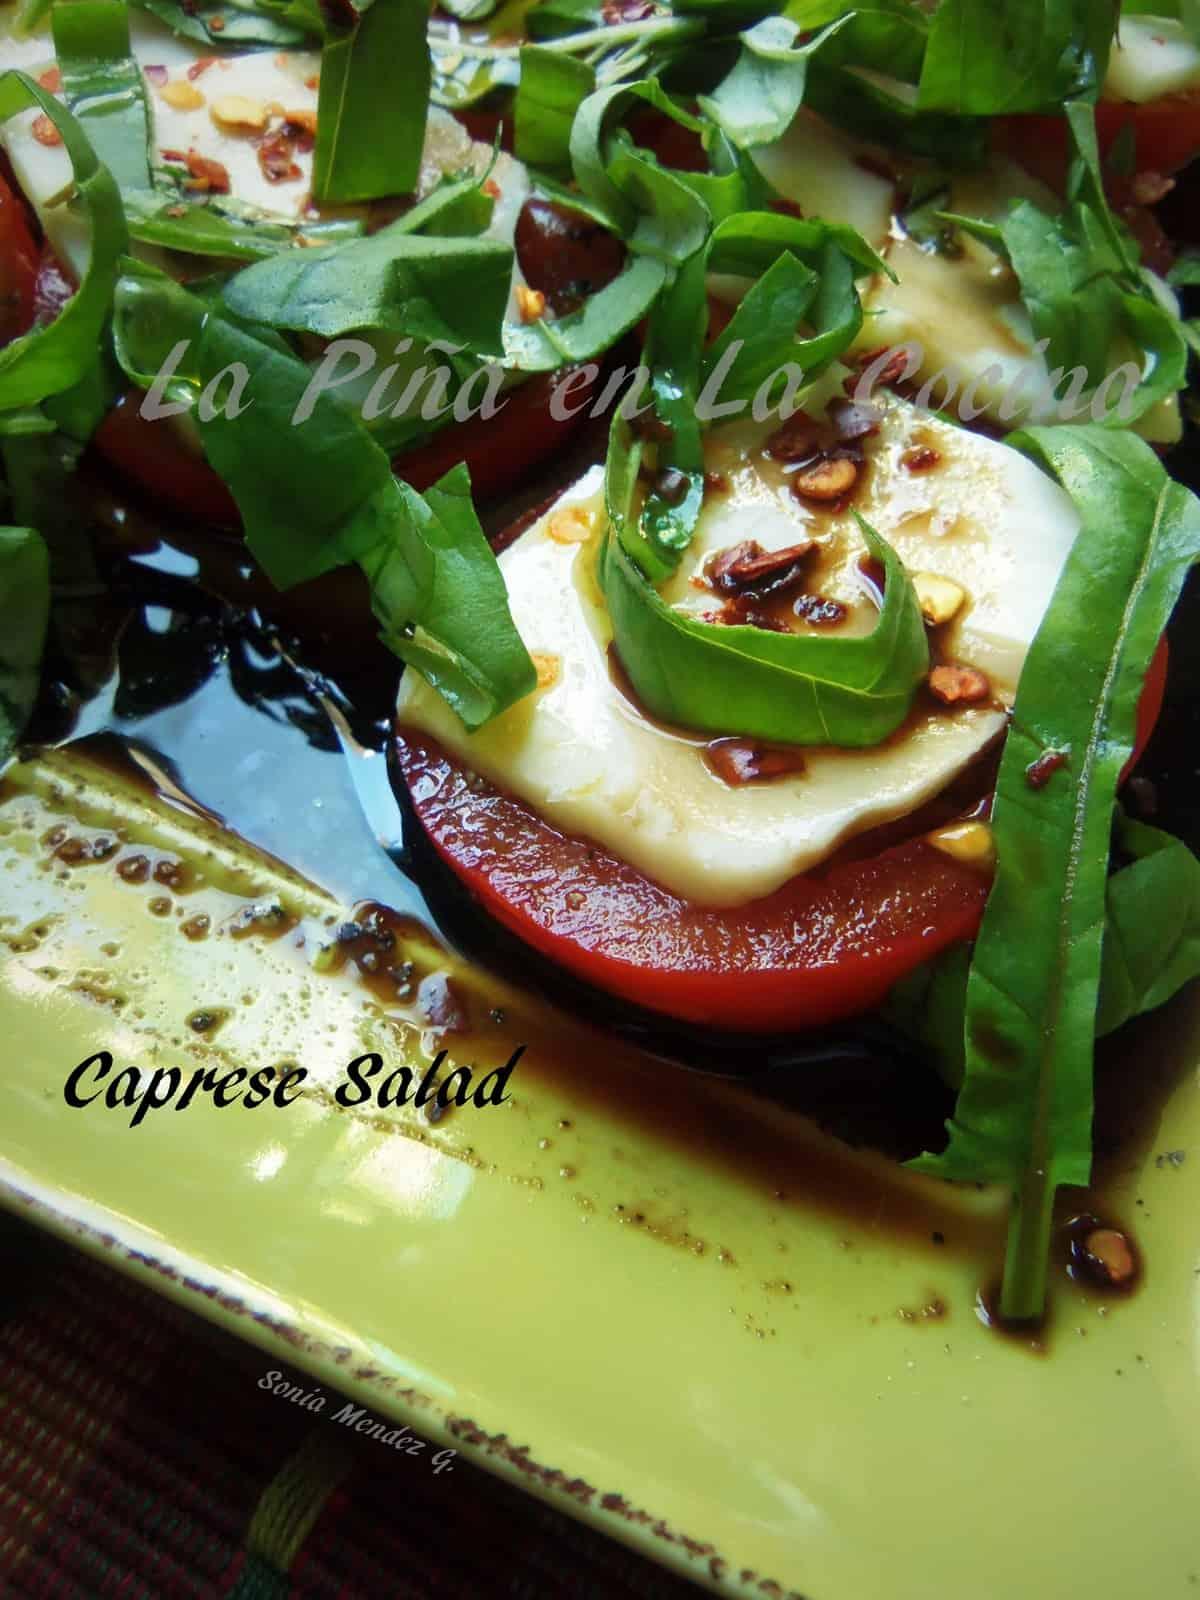 Caprese Salad, Tomato, Mozzarella and Fresh Basil with Balsamic Vinegar, Olive oil